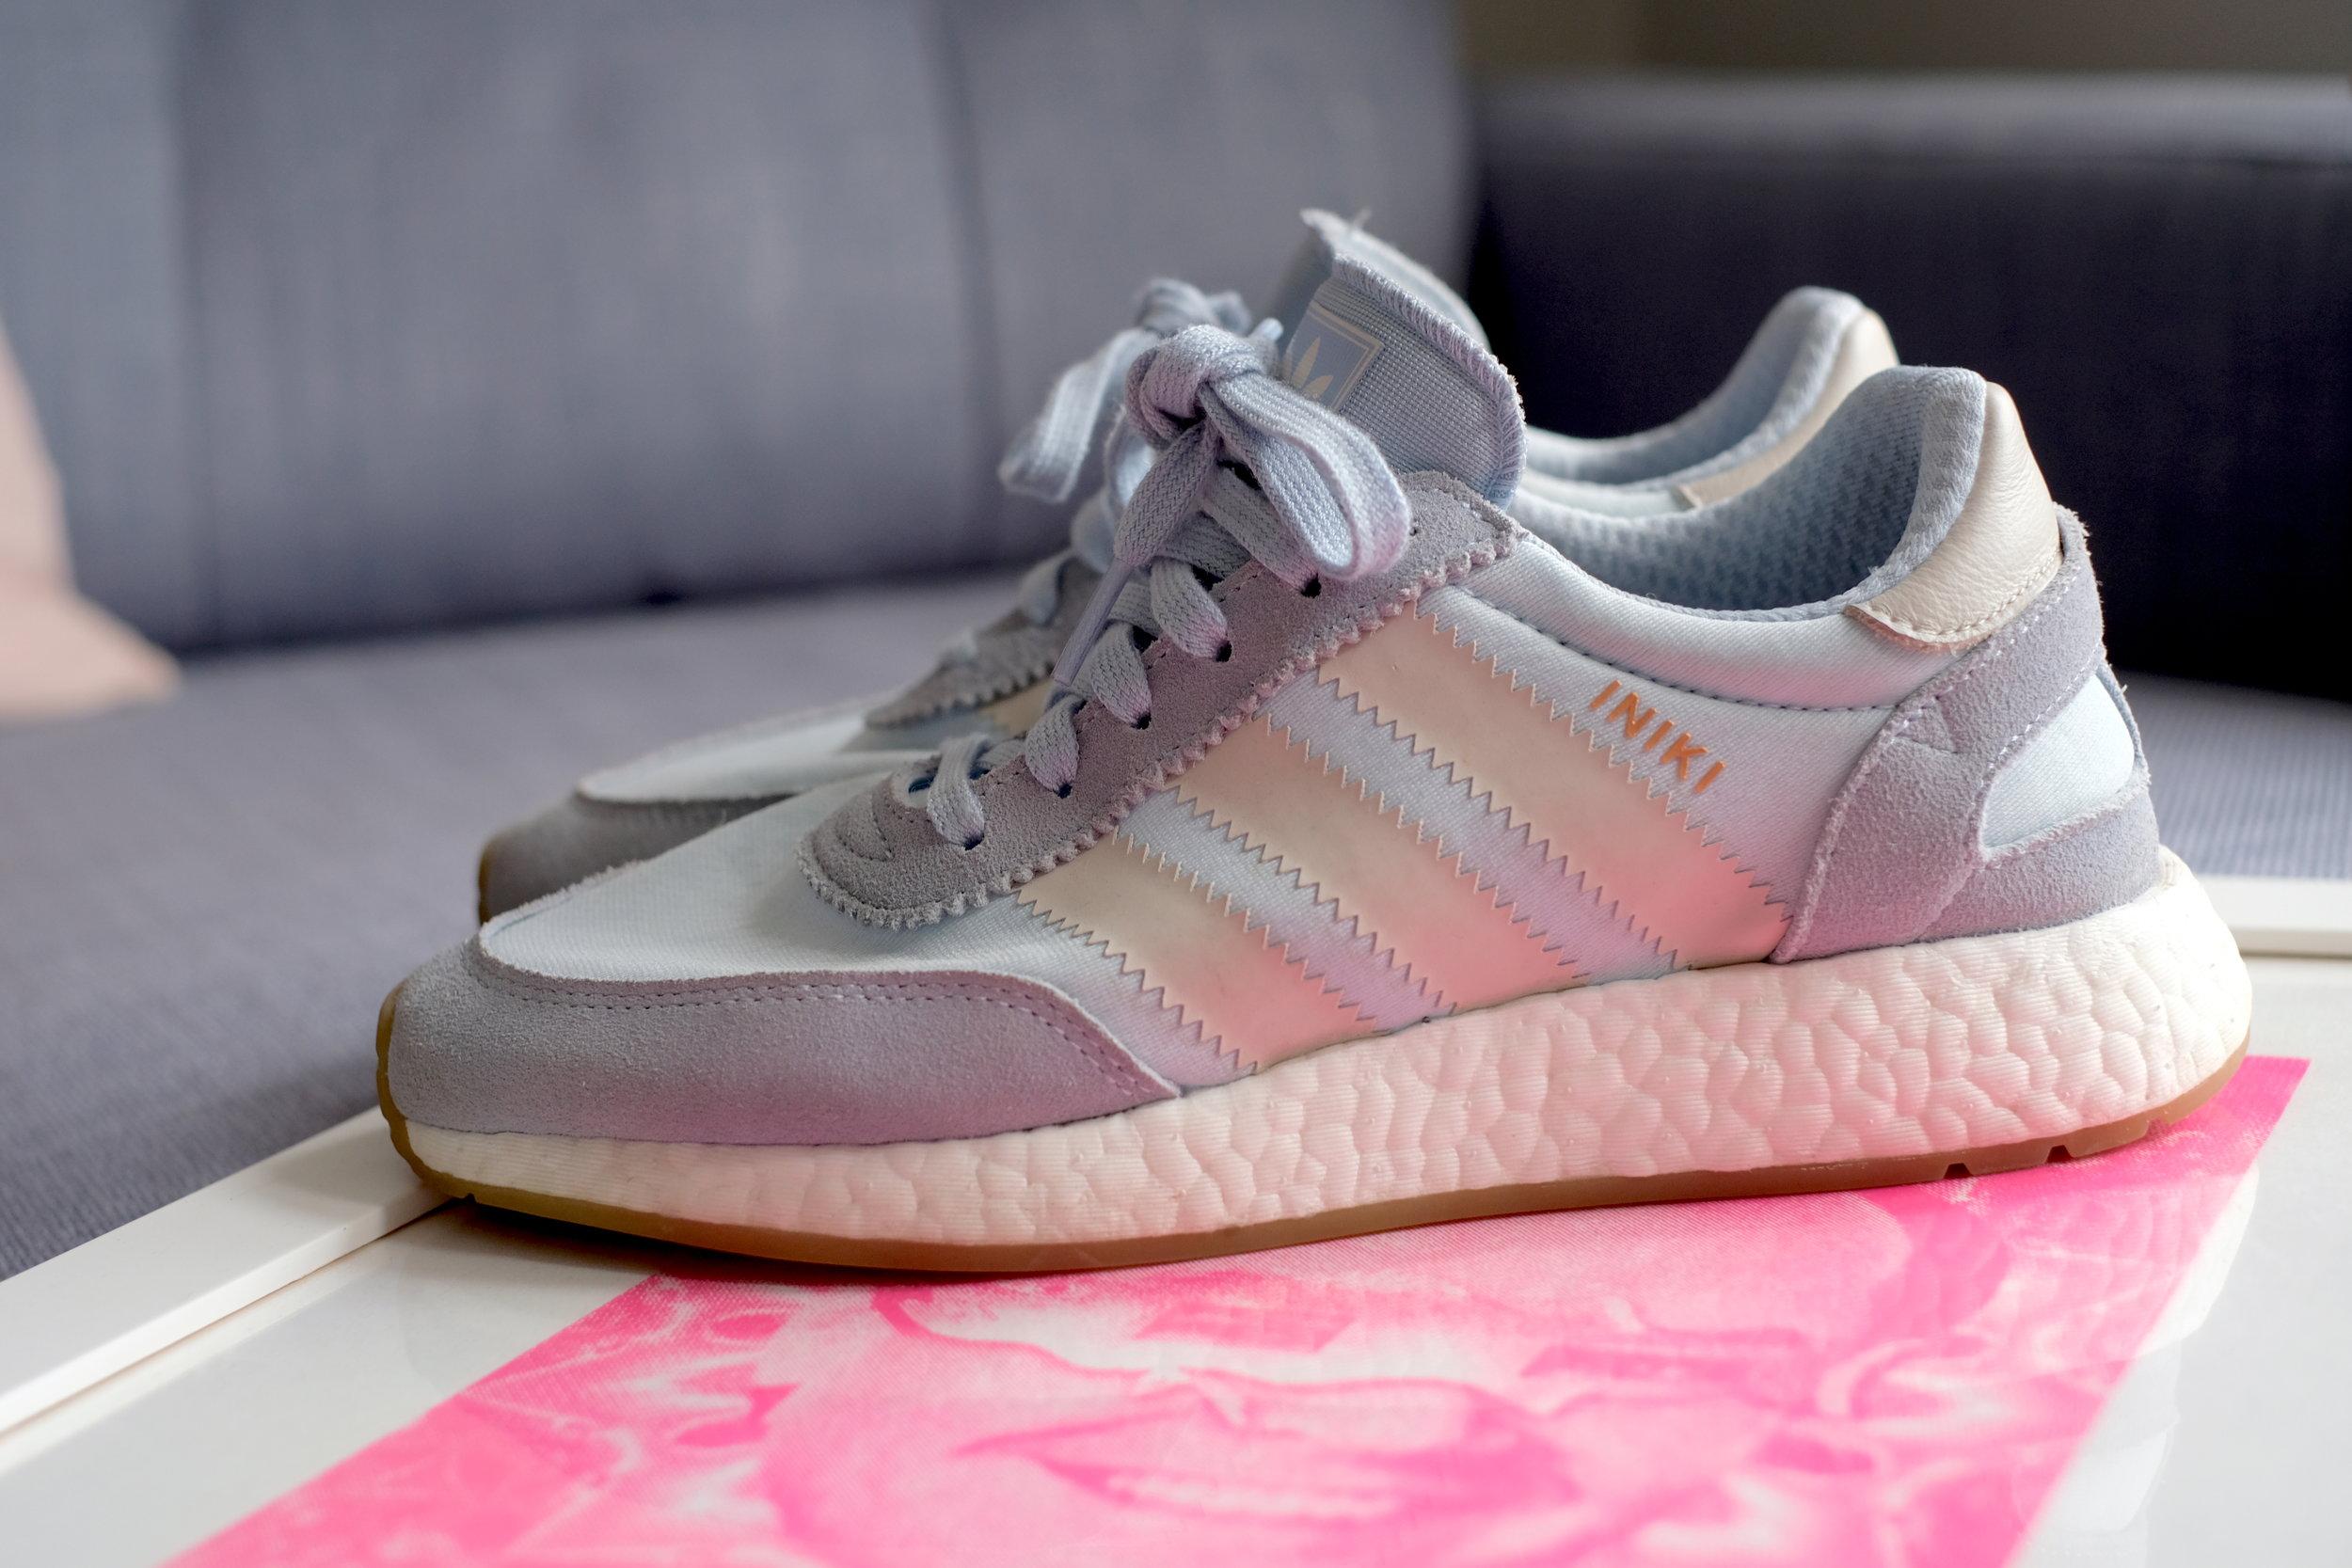 http://www.adidas.co.uk/iniki